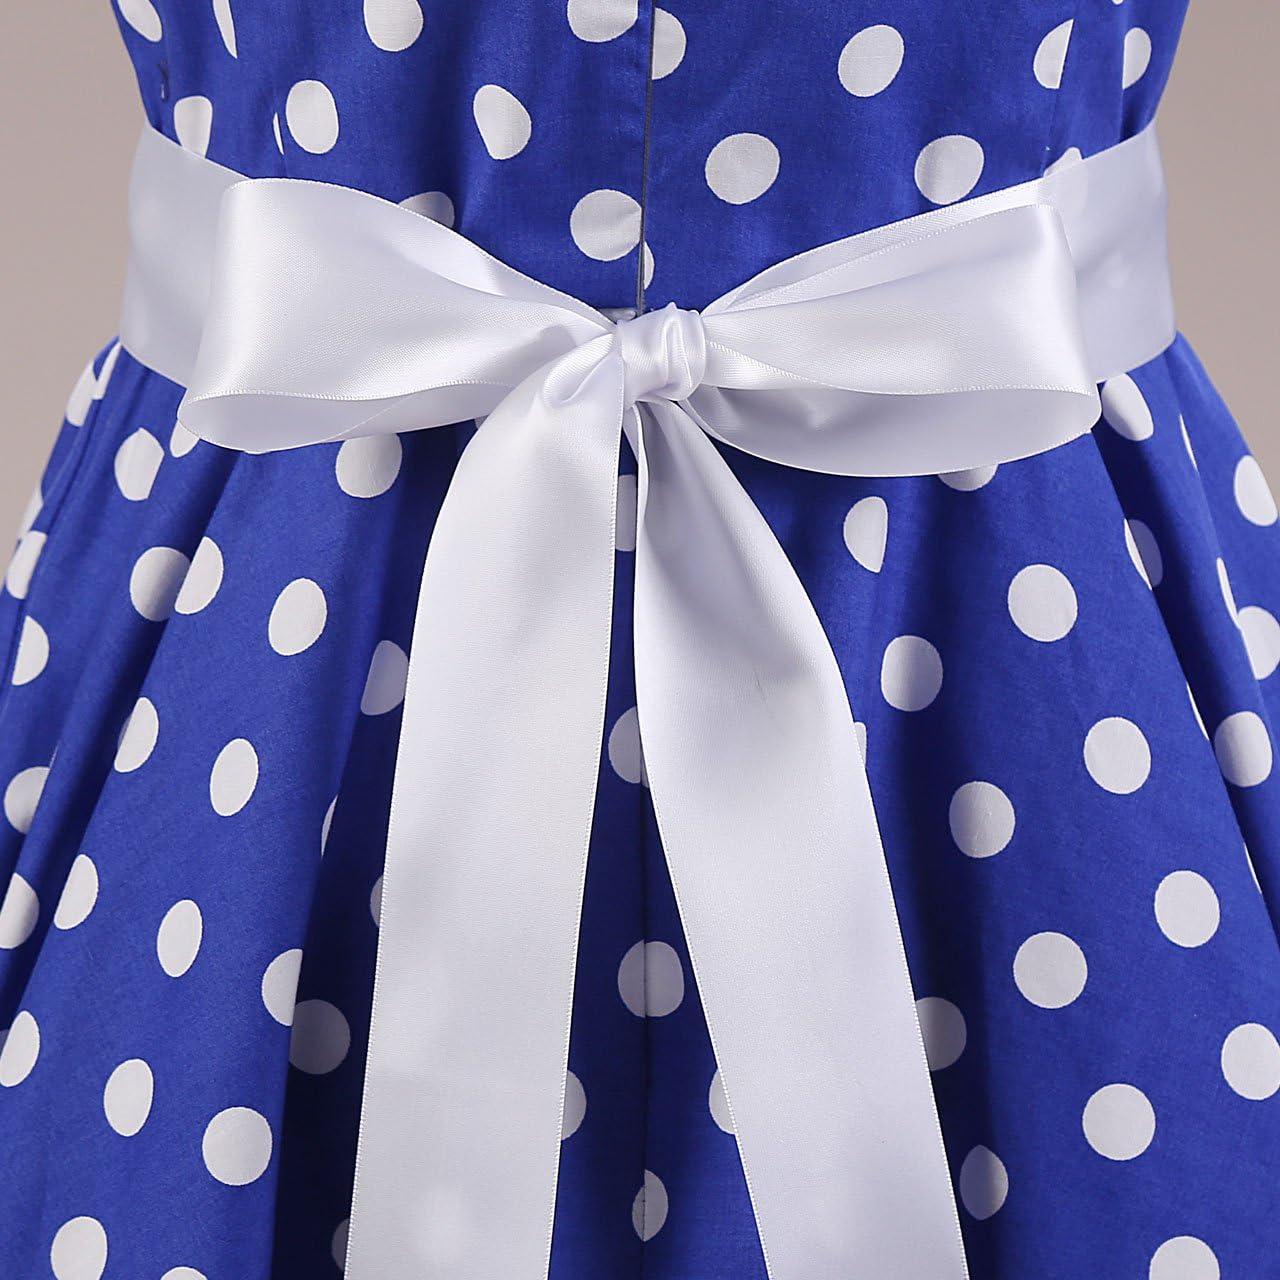 Summer Dress U Vintage 50s 60s Sleeveless Retro Style Rockabilly Swing Dress Polka Dot